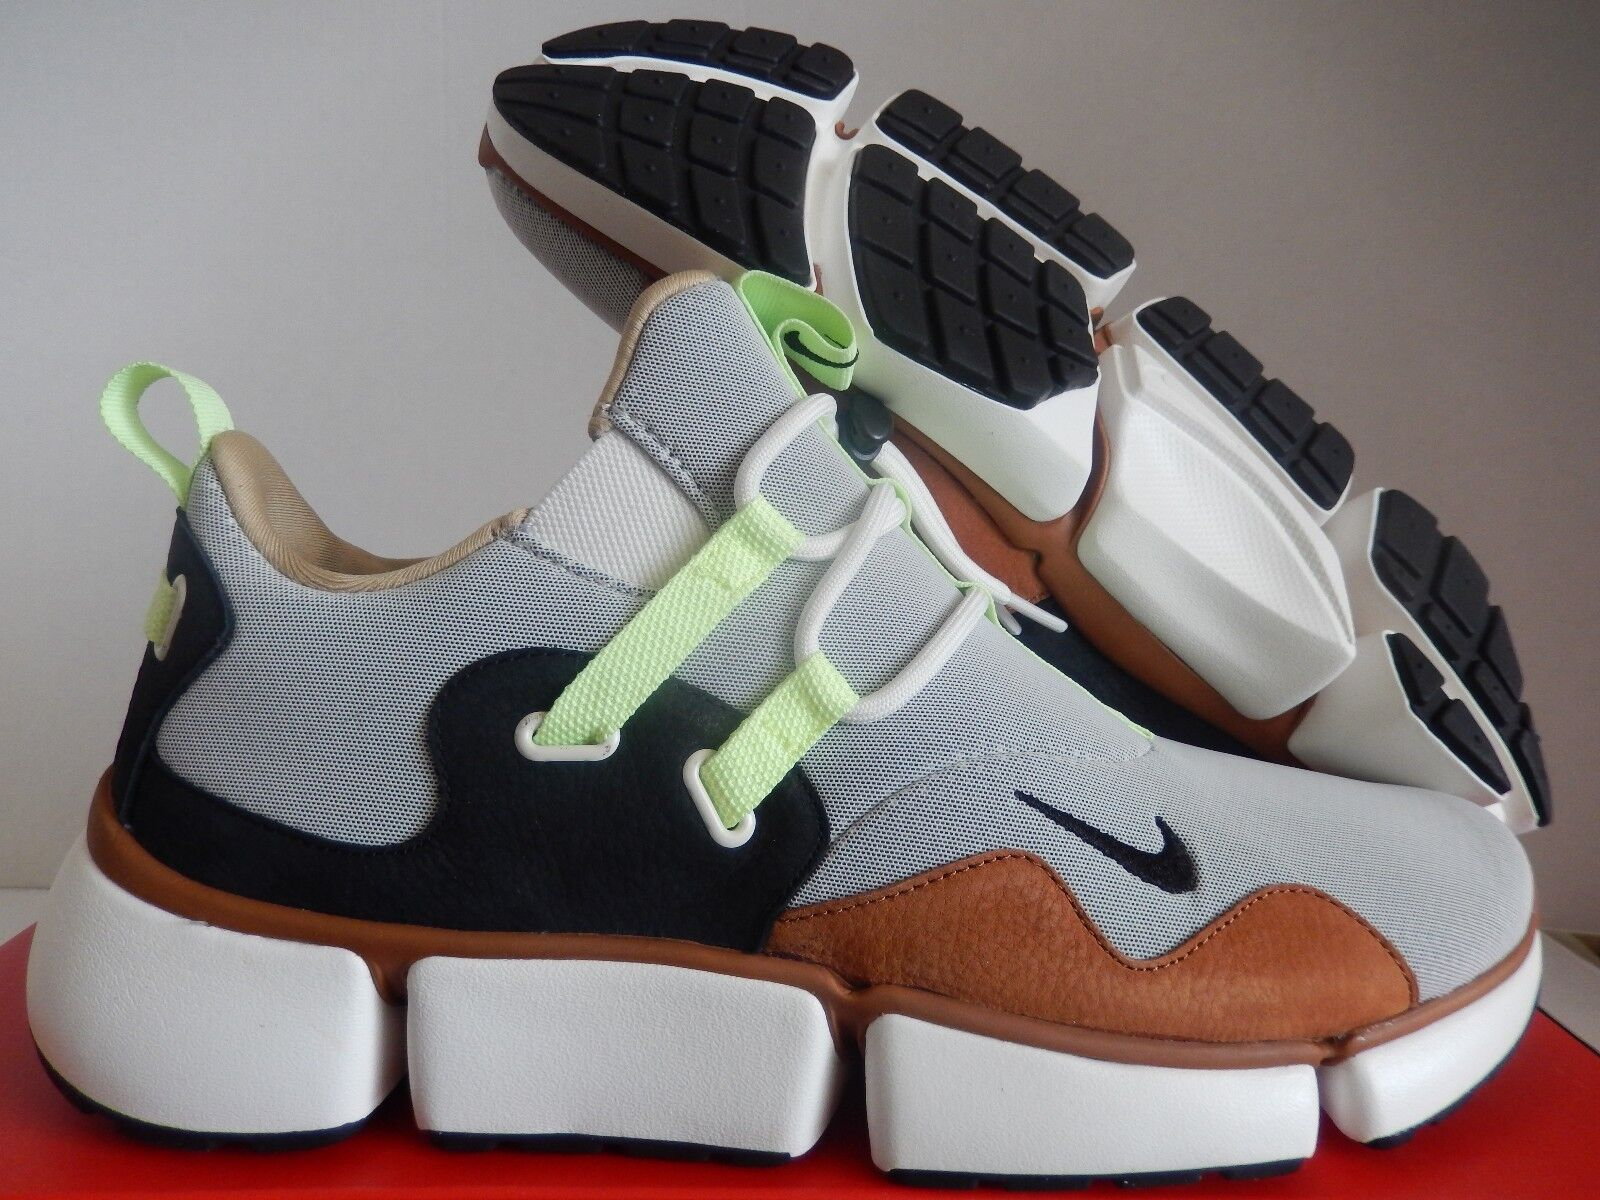 Nike nikelab coltellino dm tawny brown-nero-barely volt sz 11 [910571-201]